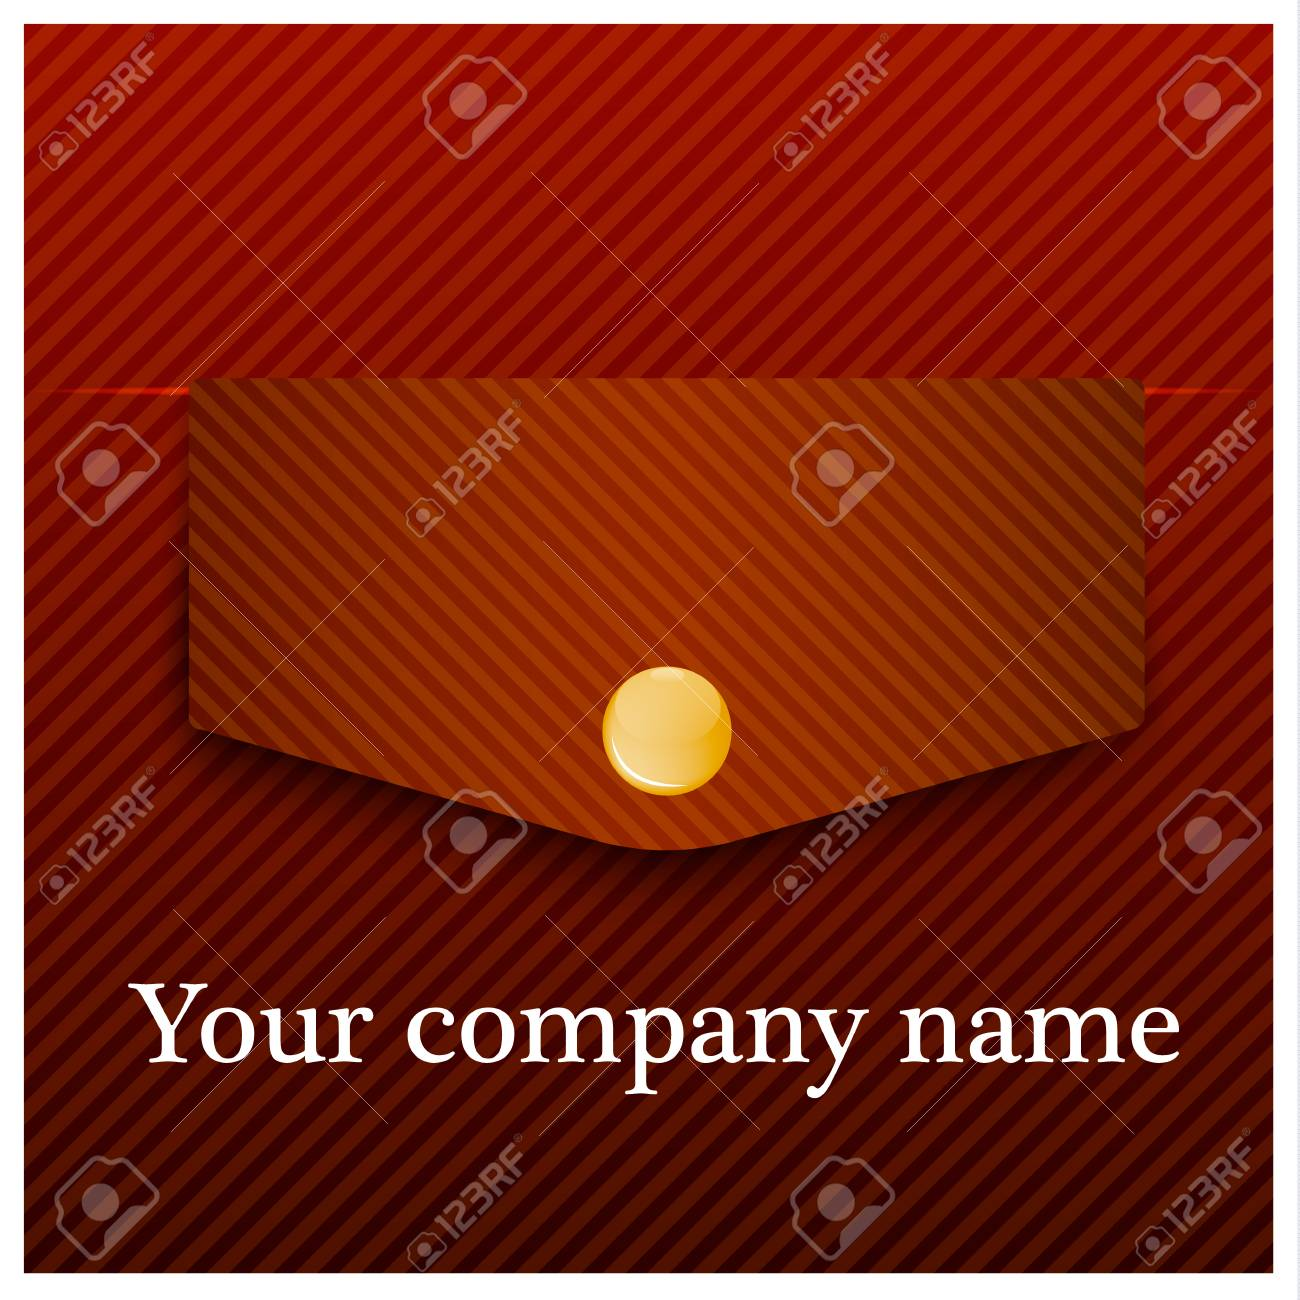 cover pocket - 69554101